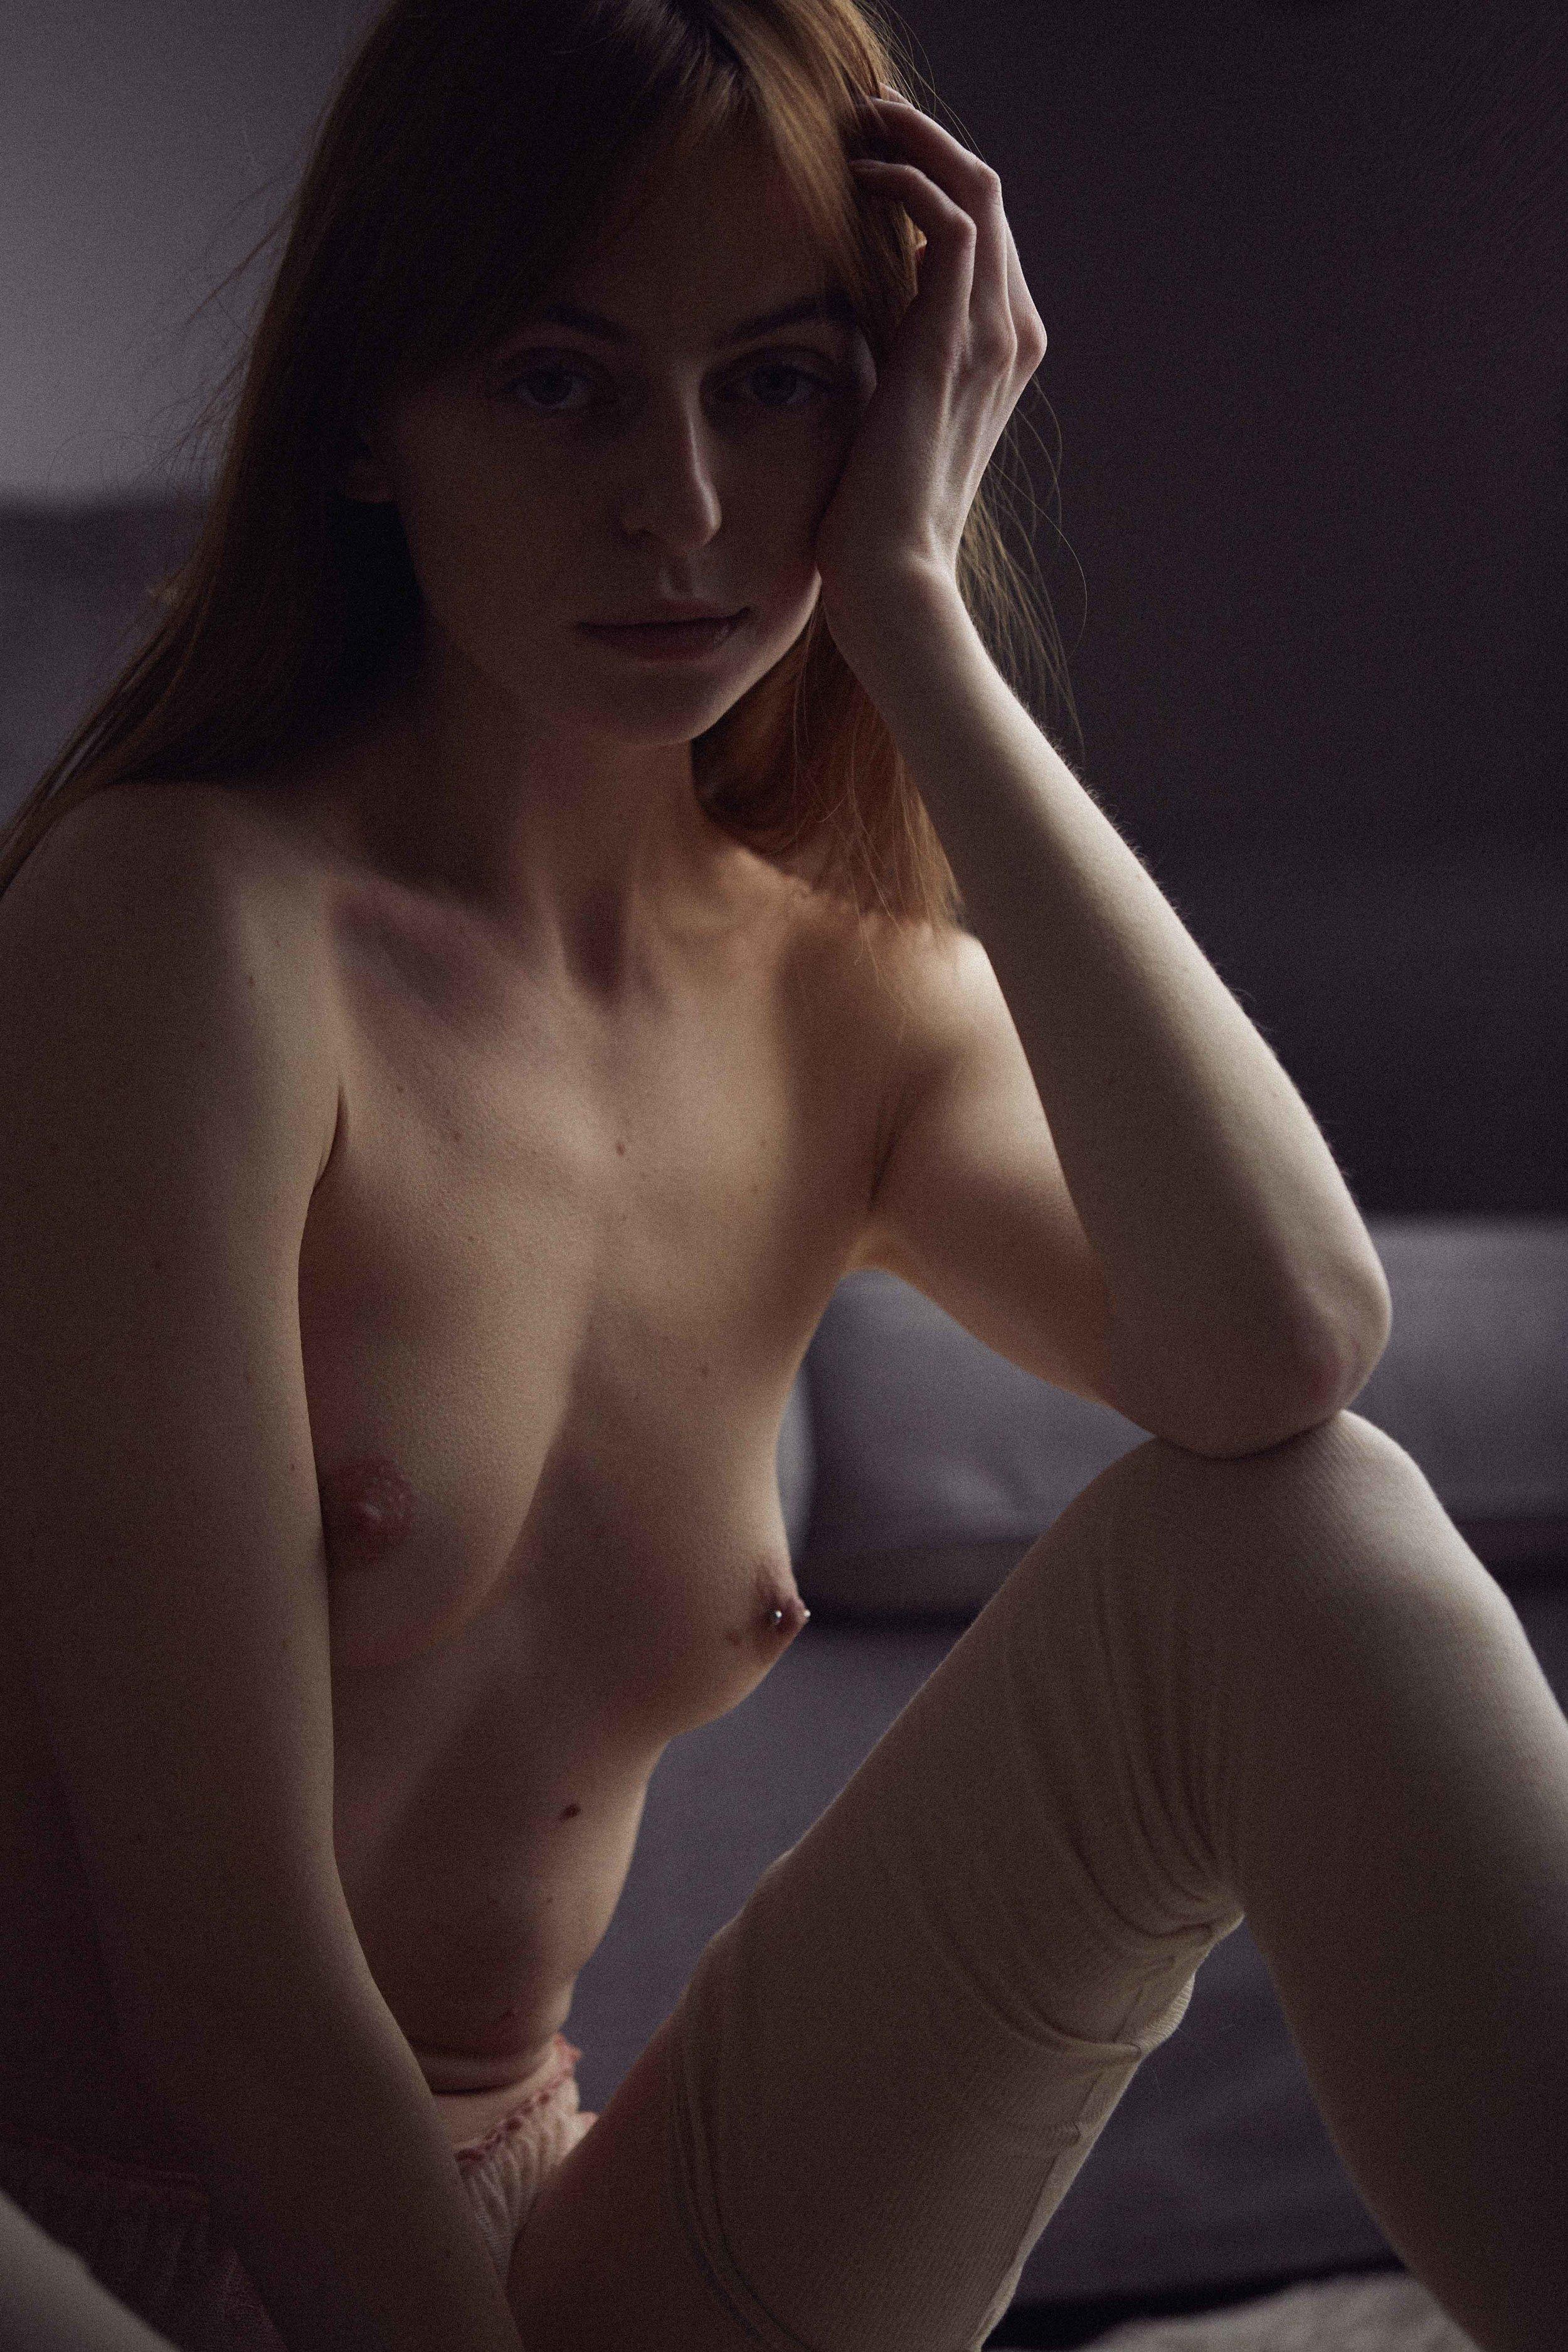 nude5560.jpg